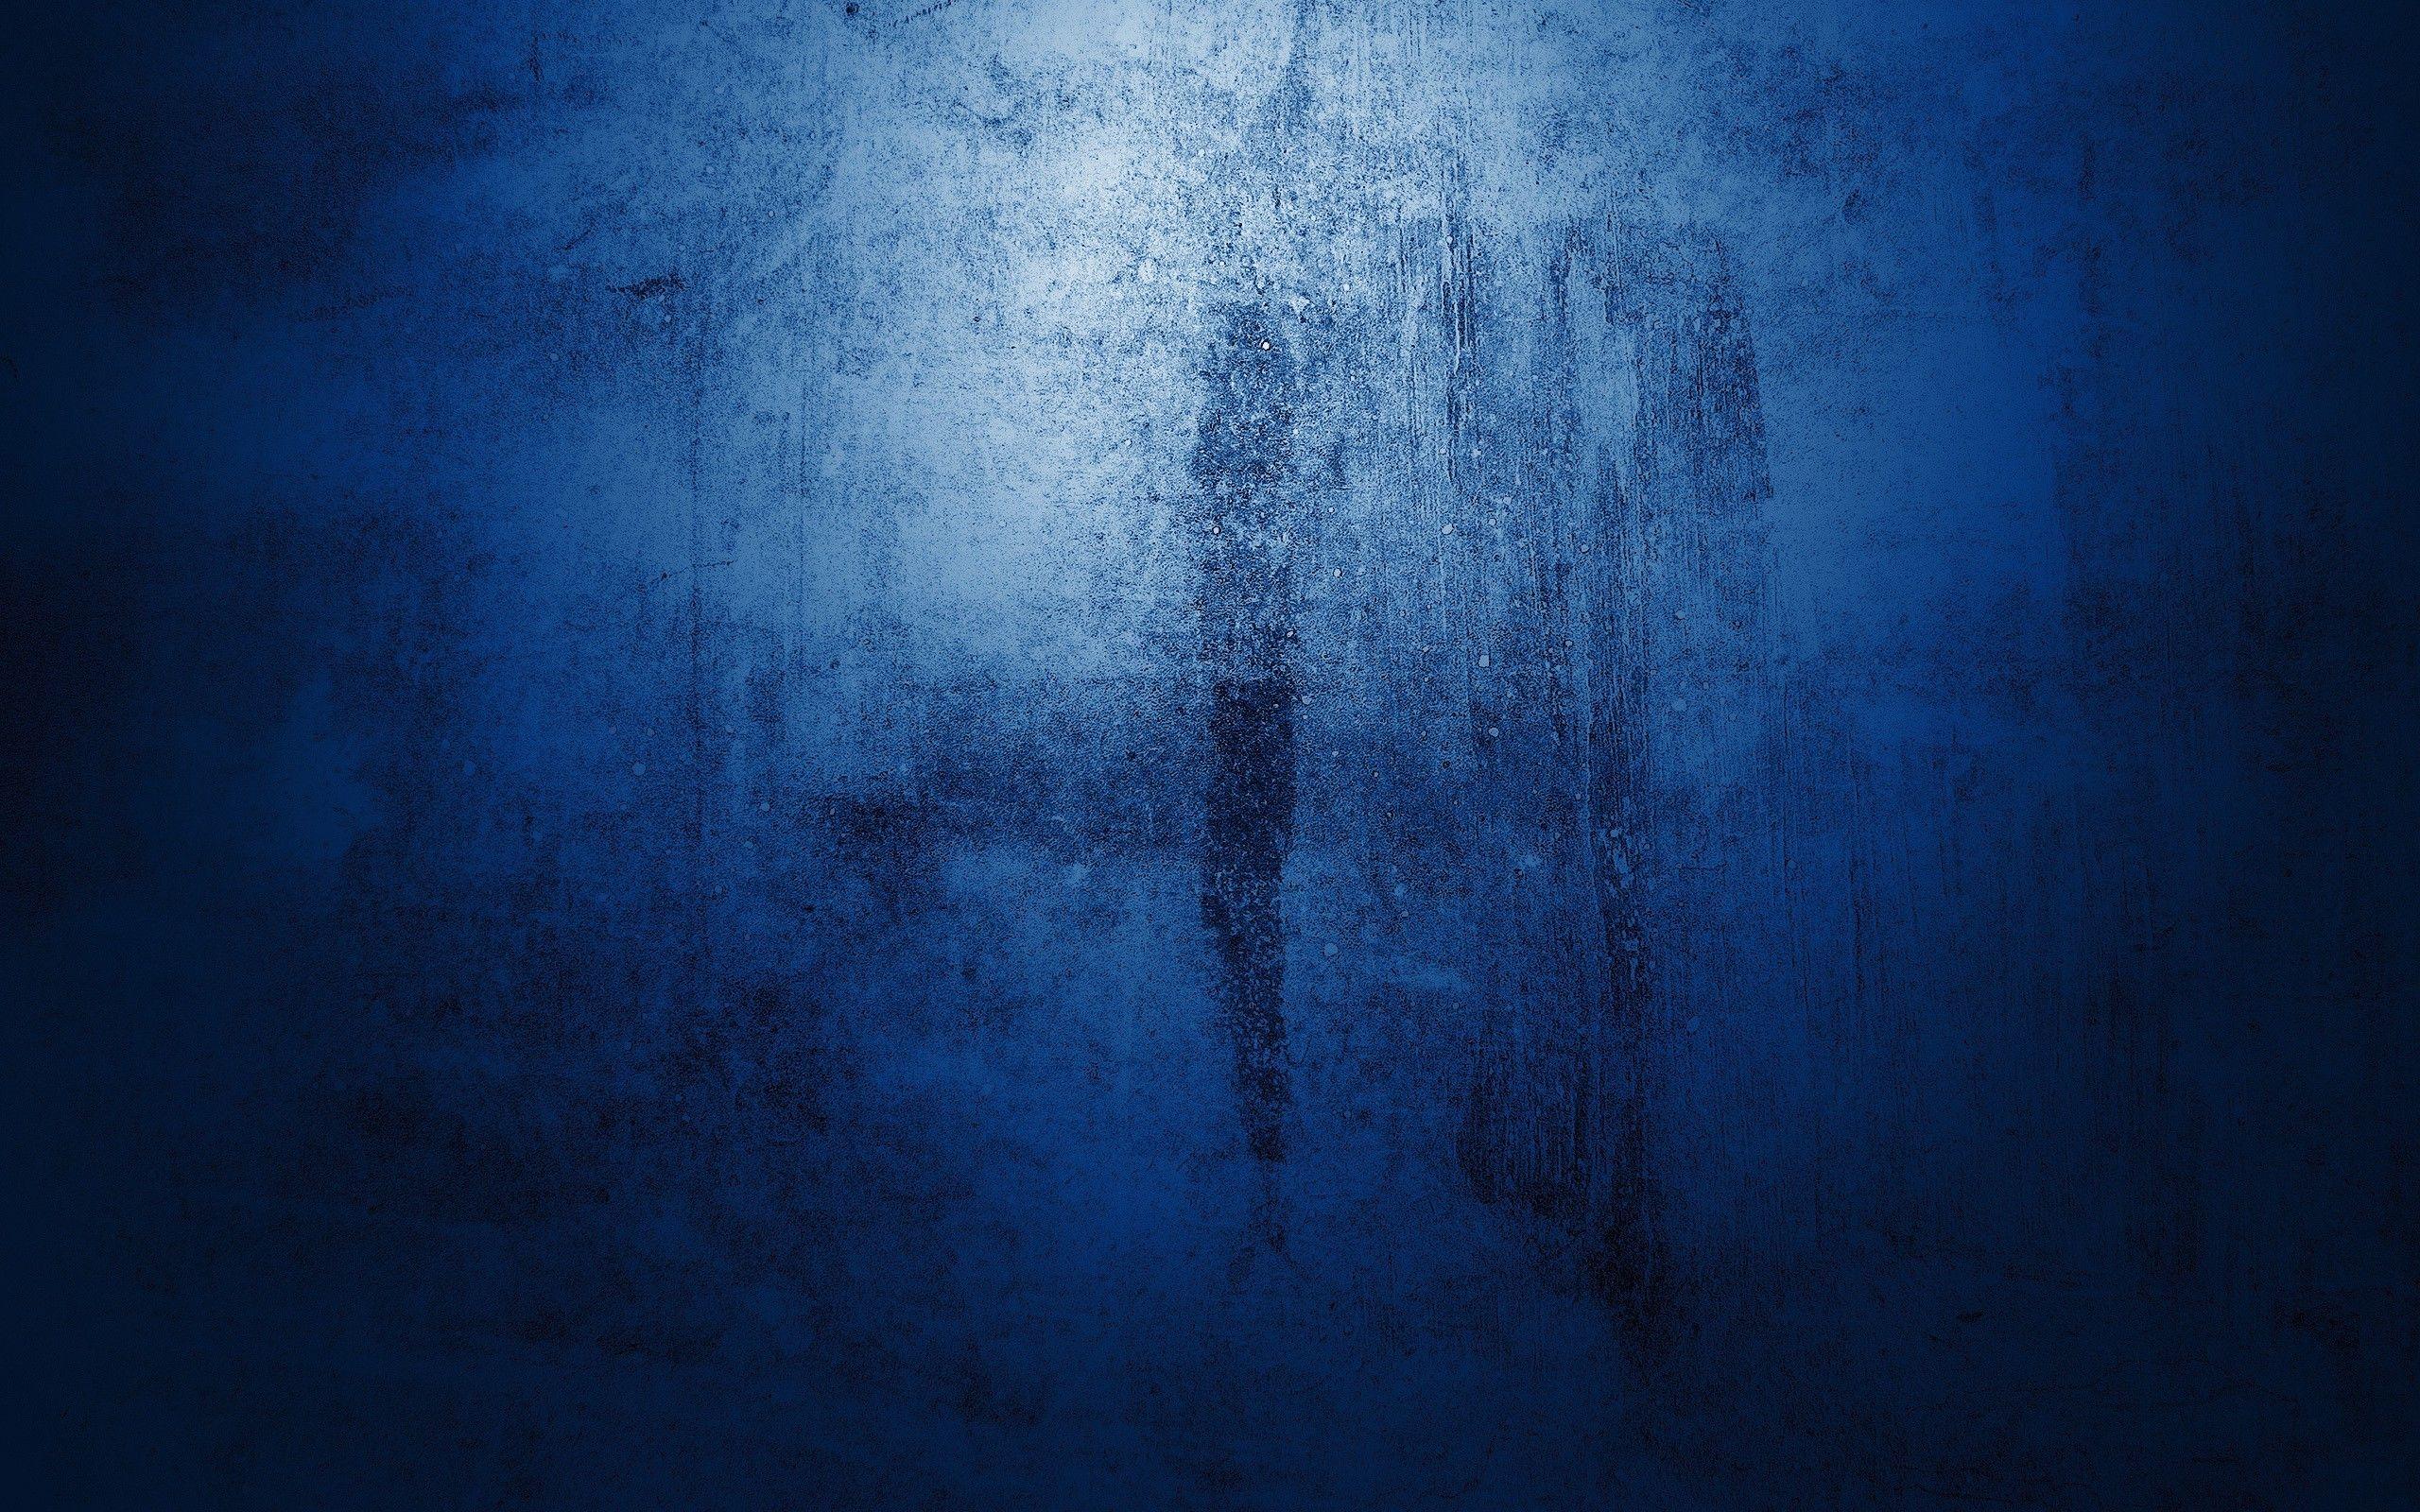 Blue Texture Best 31625 Texture Blue White Textured Wallpaper